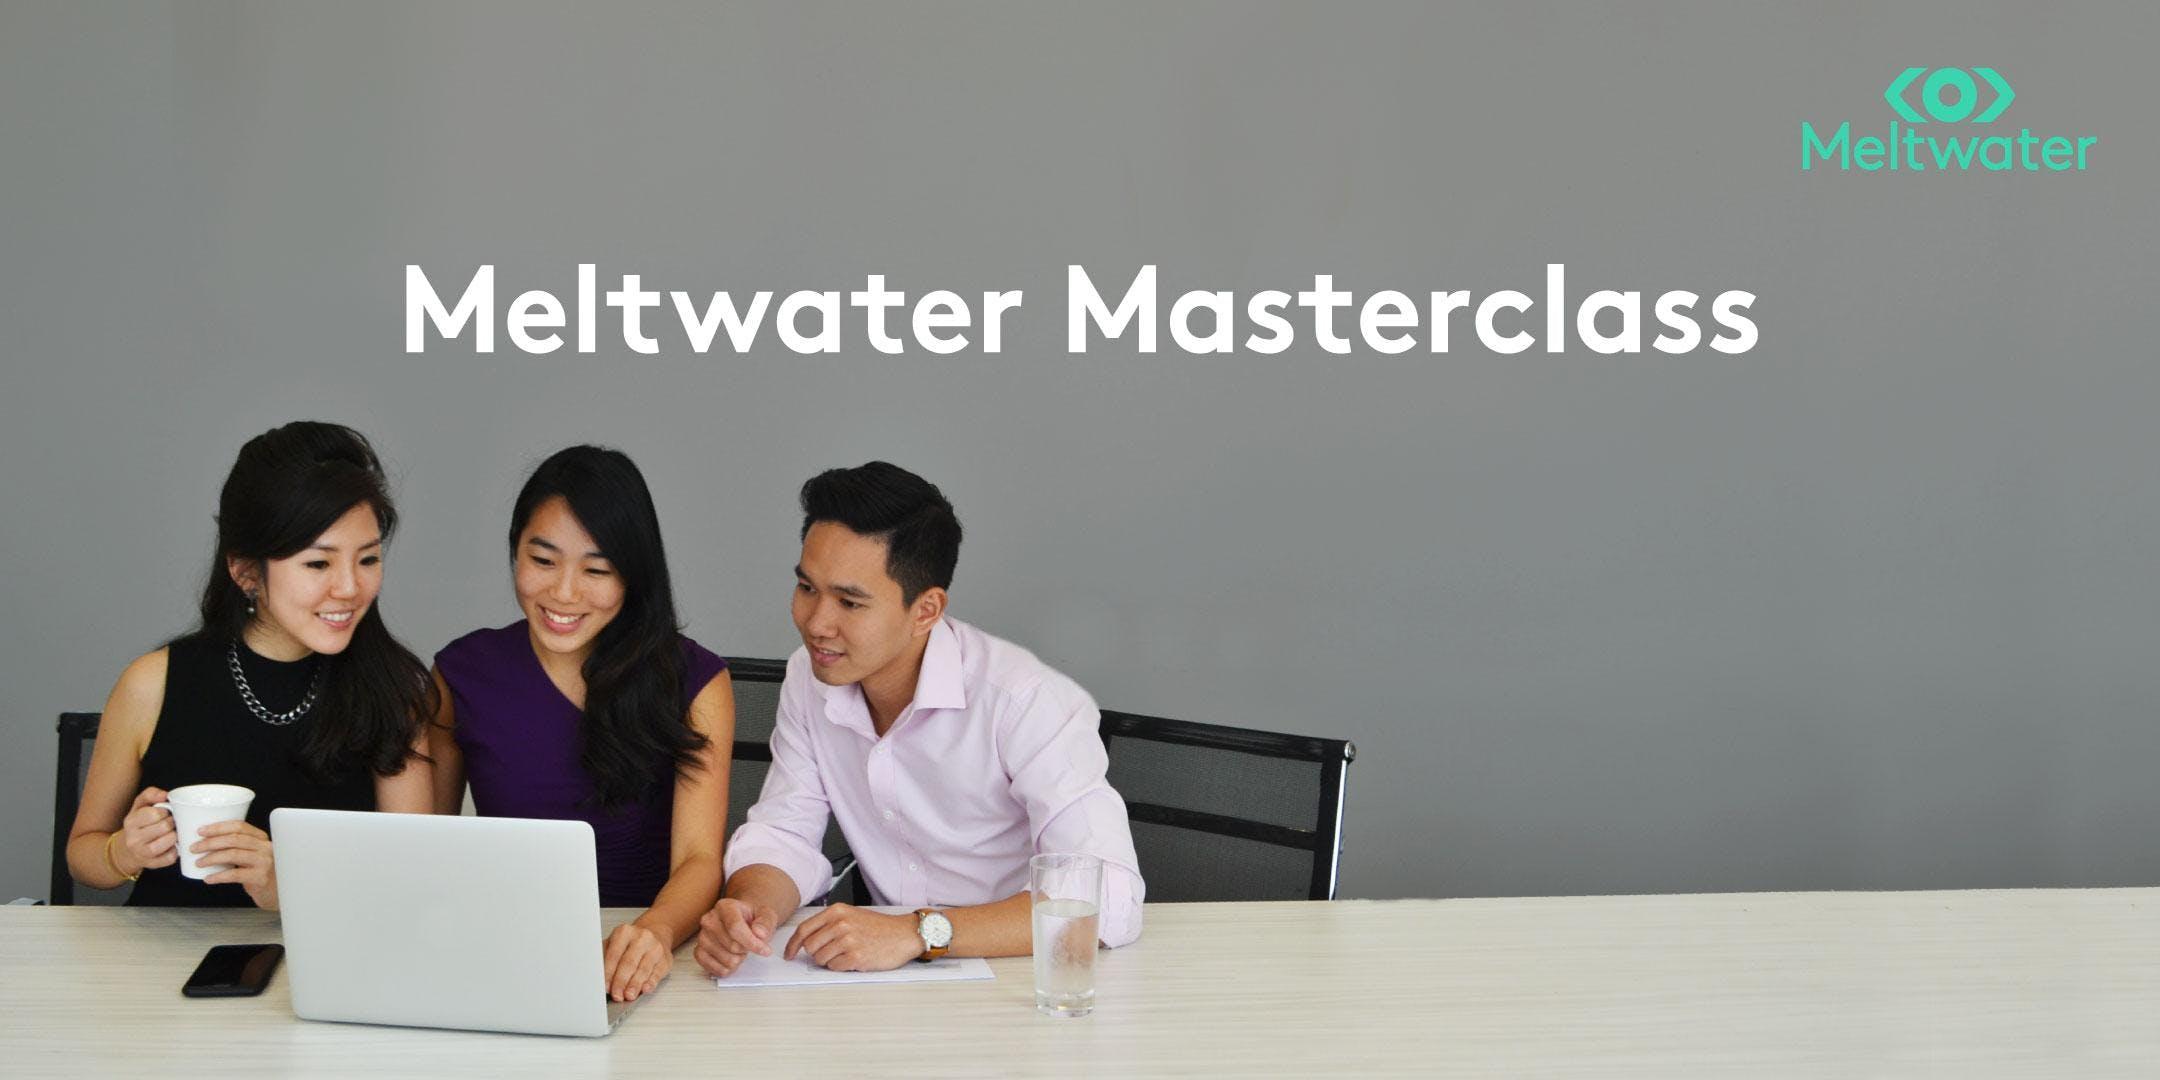 Meltwater Masterclass